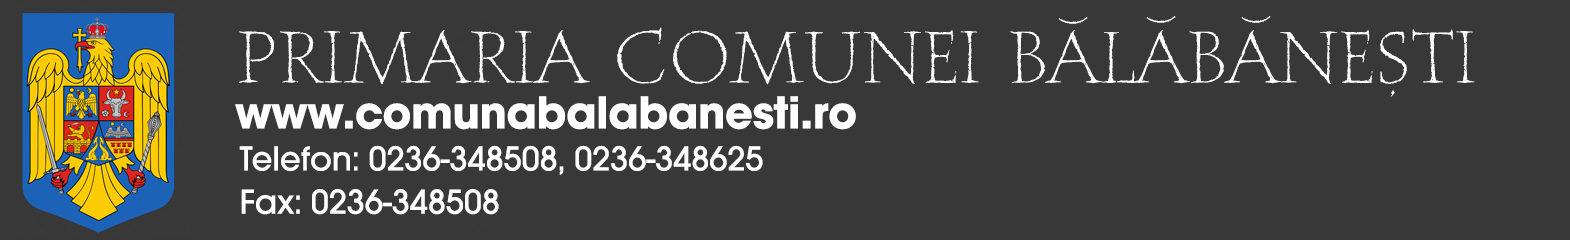 Primaria Comunei Balabanesti – Judetul Galati – Romania